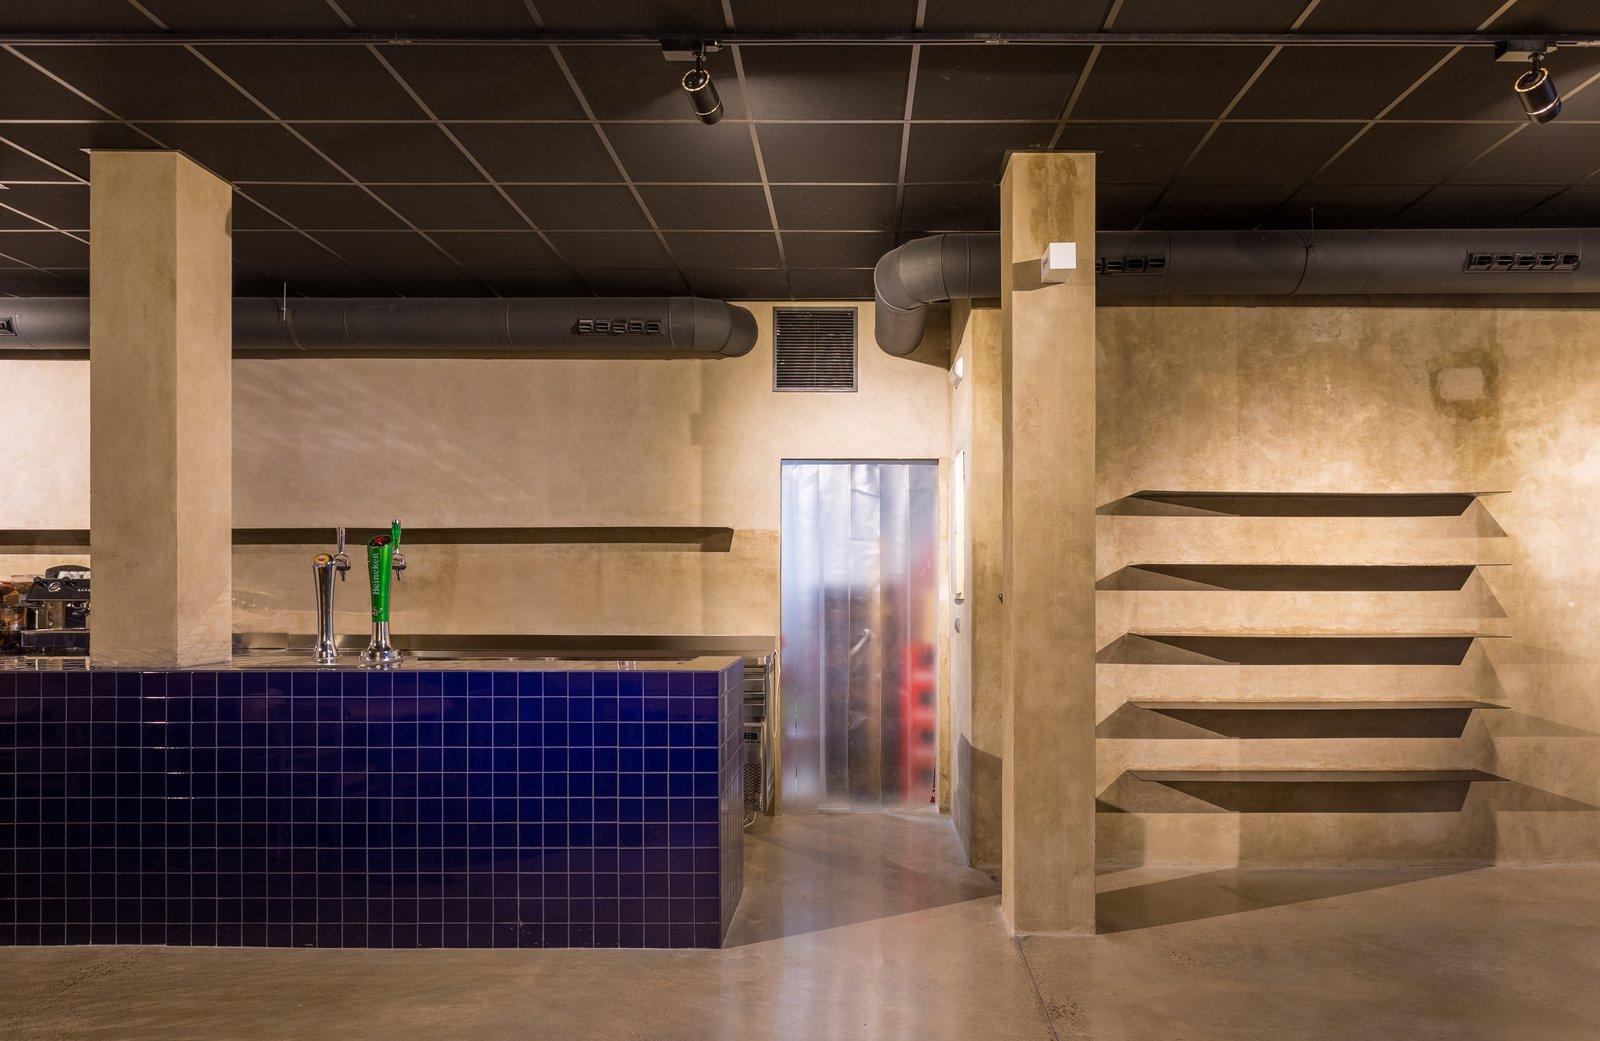 Kitchen, Tile Counter, Track Lighting, Wall Lighting, Accent Lighting, Concrete Floor, and Ceramic Tile Backsplashe The cobalt blue ceramic coated bar emerges from the floor.  IMOOD Restaurant